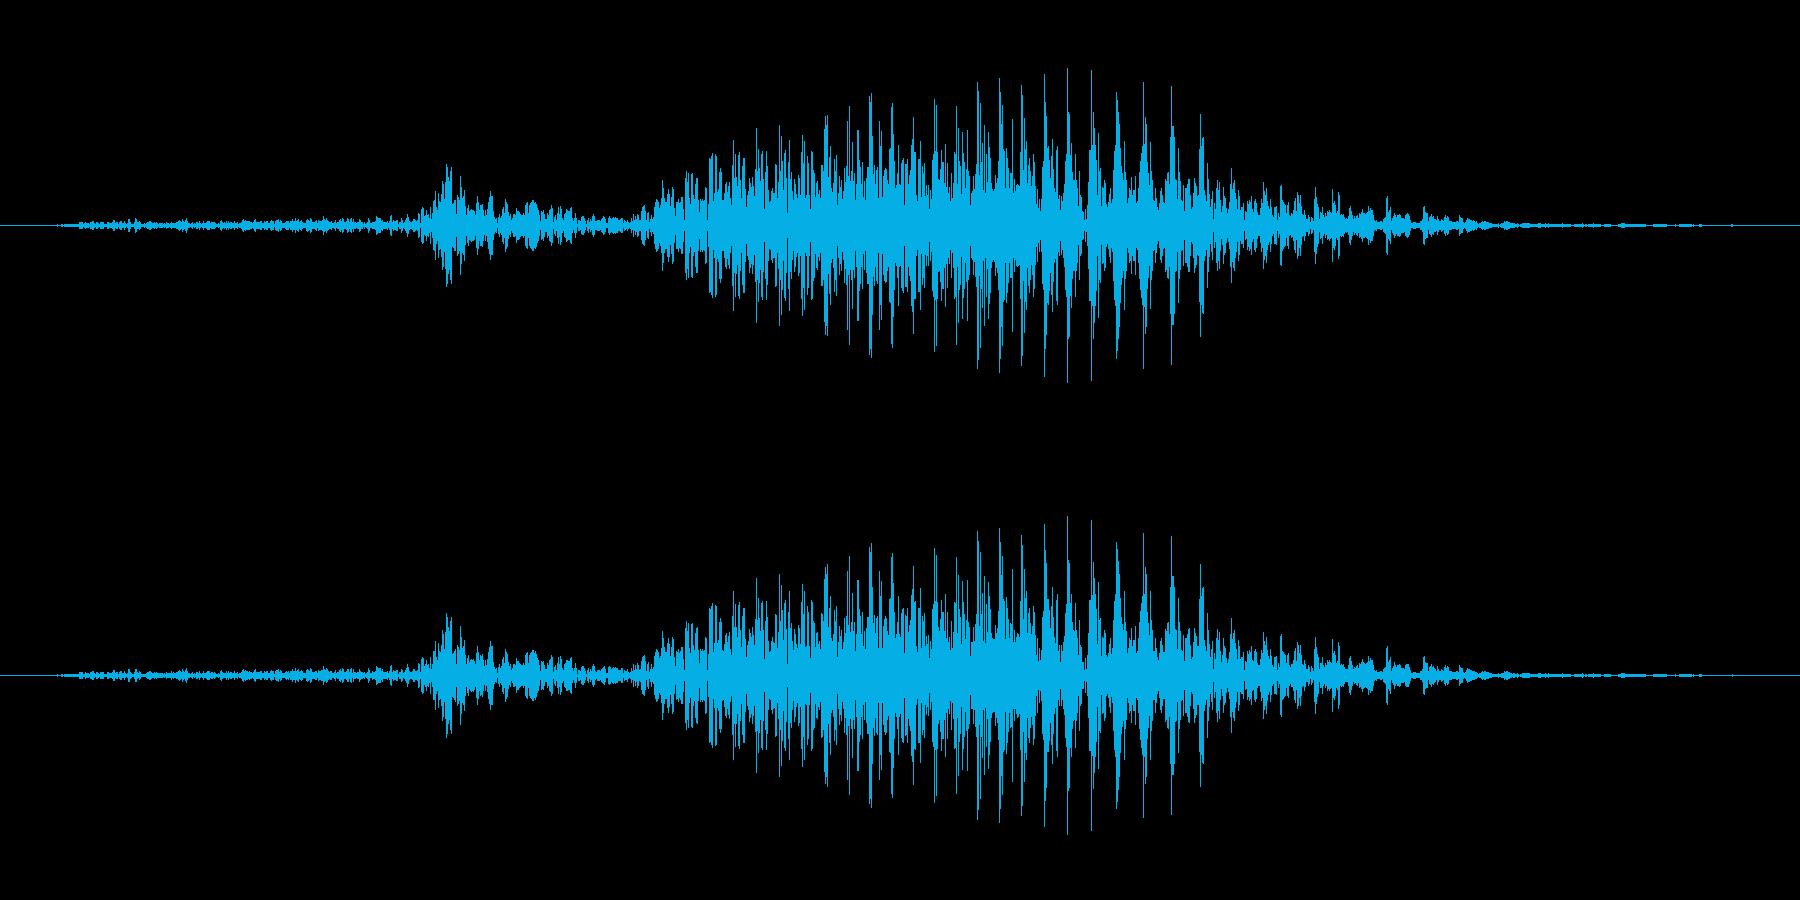 3 (three, 英語、米国男性声優…の再生済みの波形